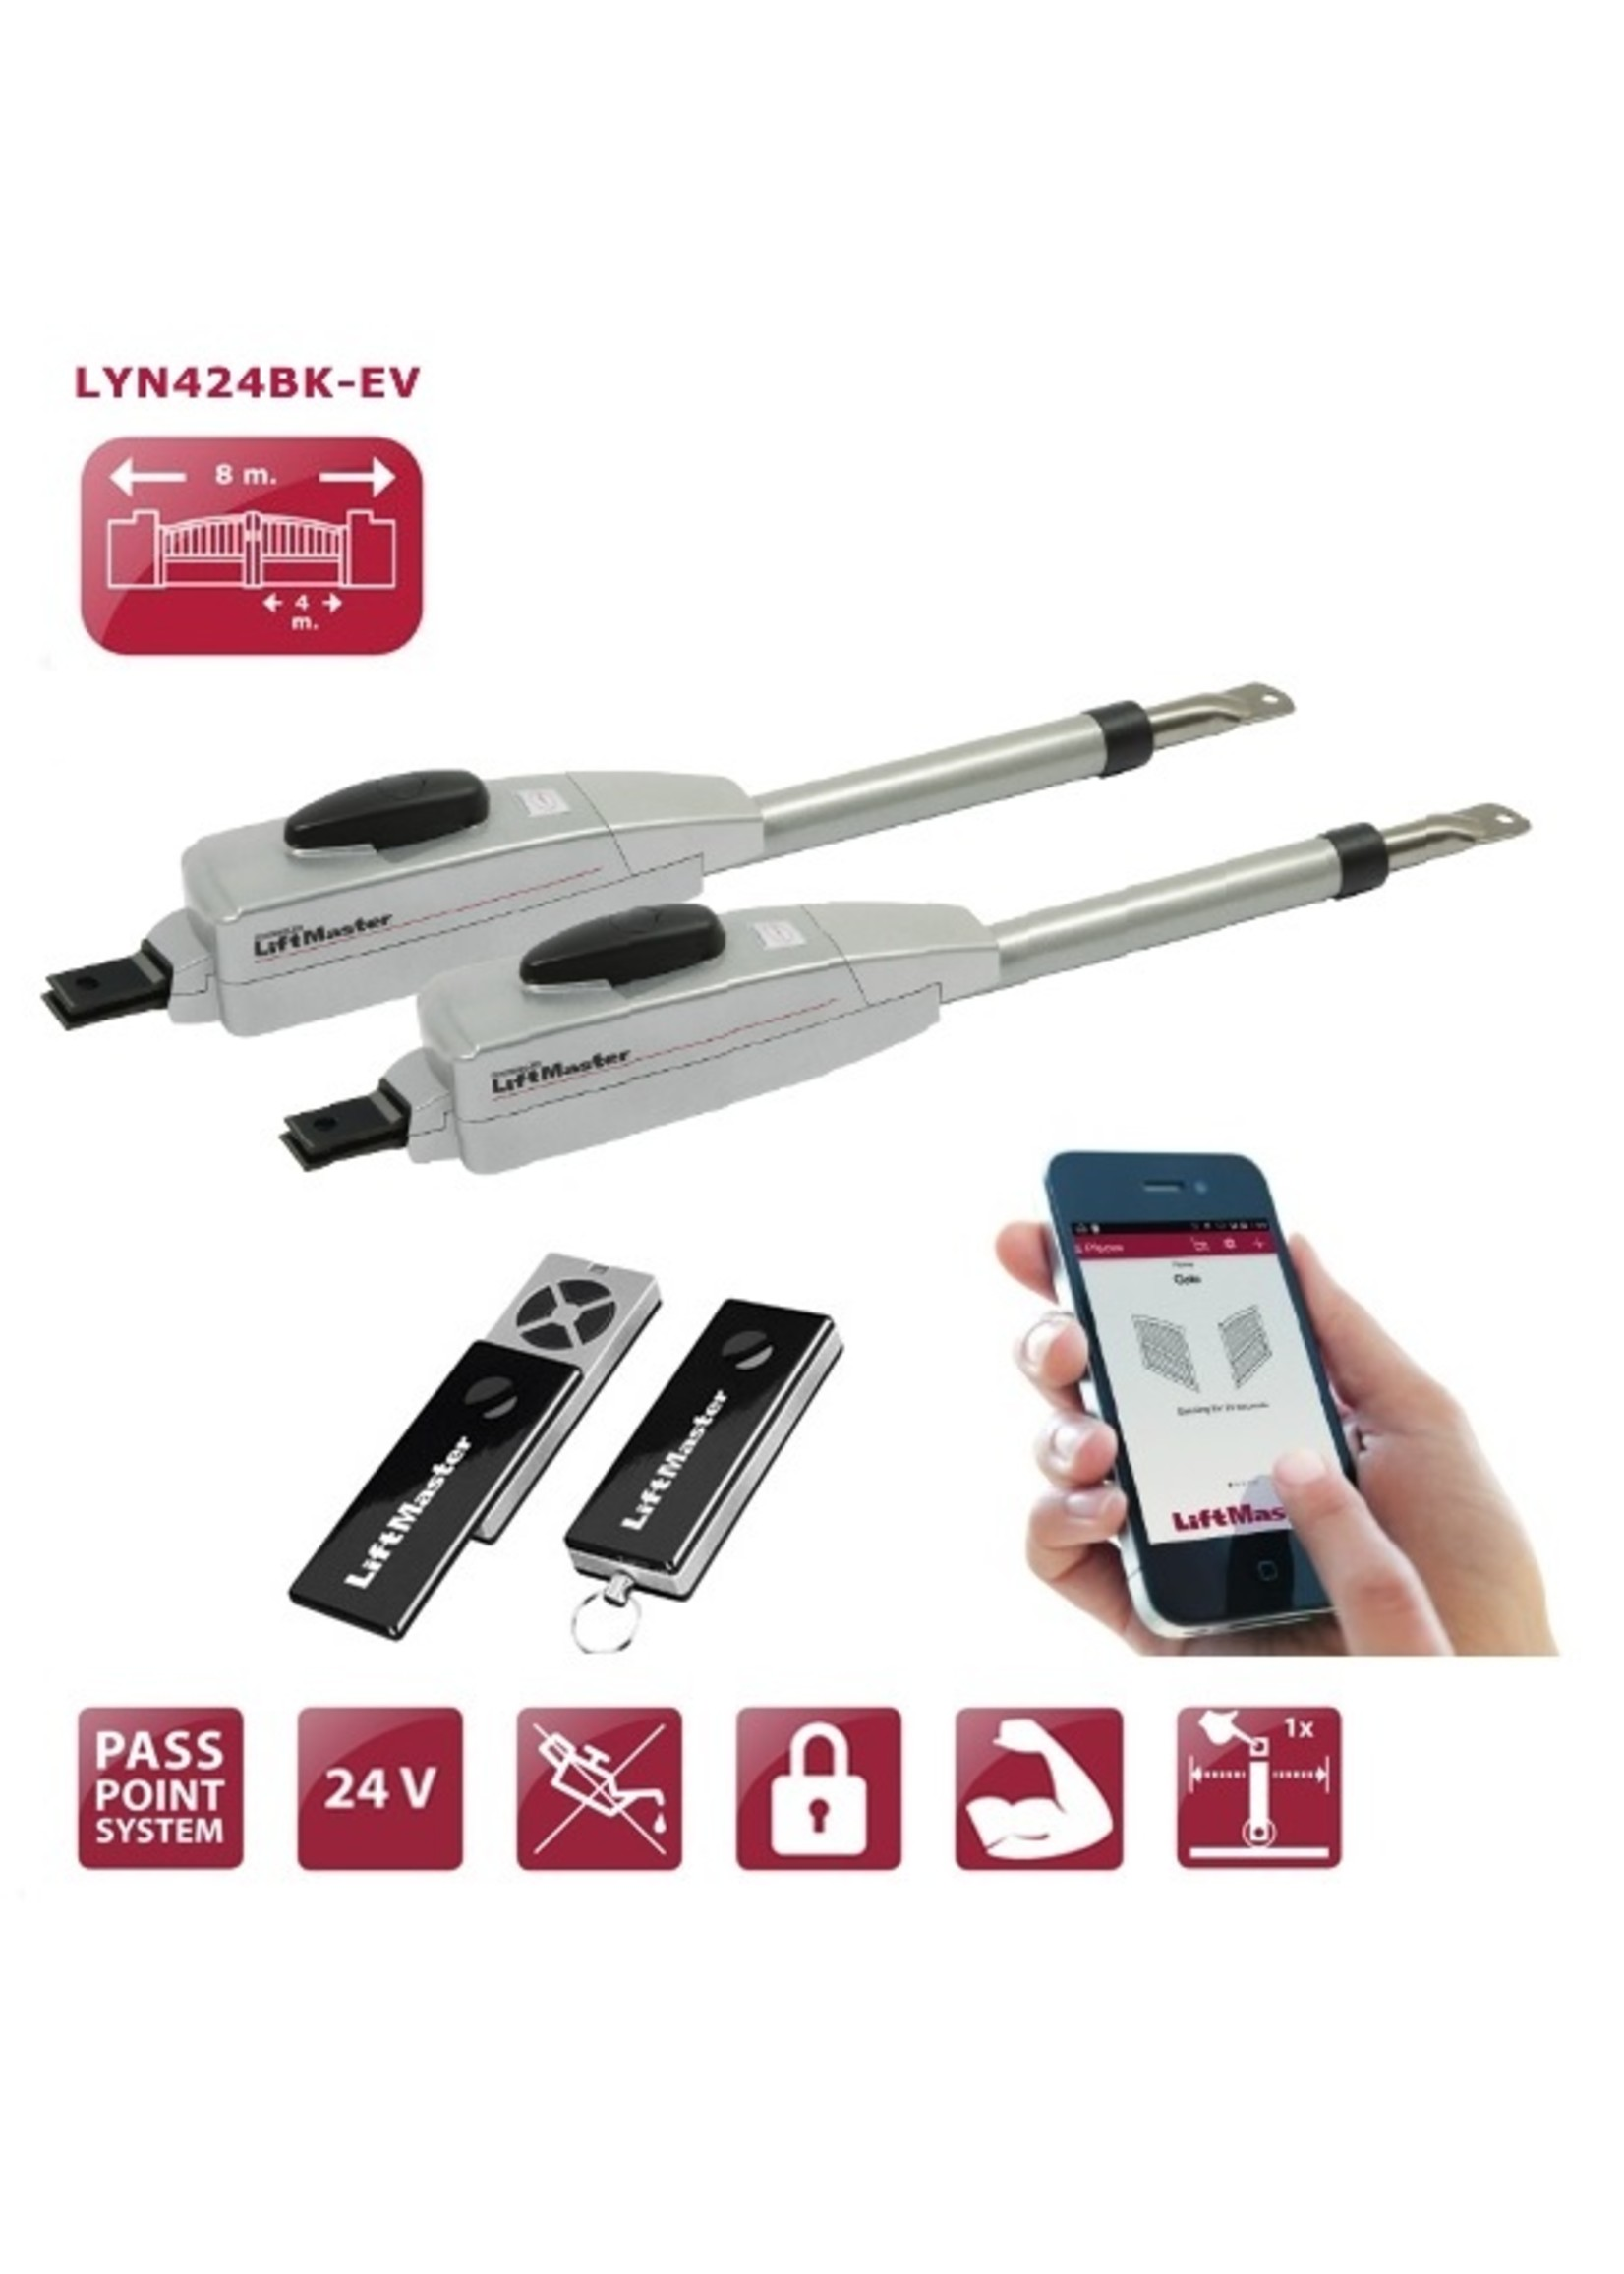 Liftmaster LYN424BK-EV 24V automatisme portail à battants LYN400-24